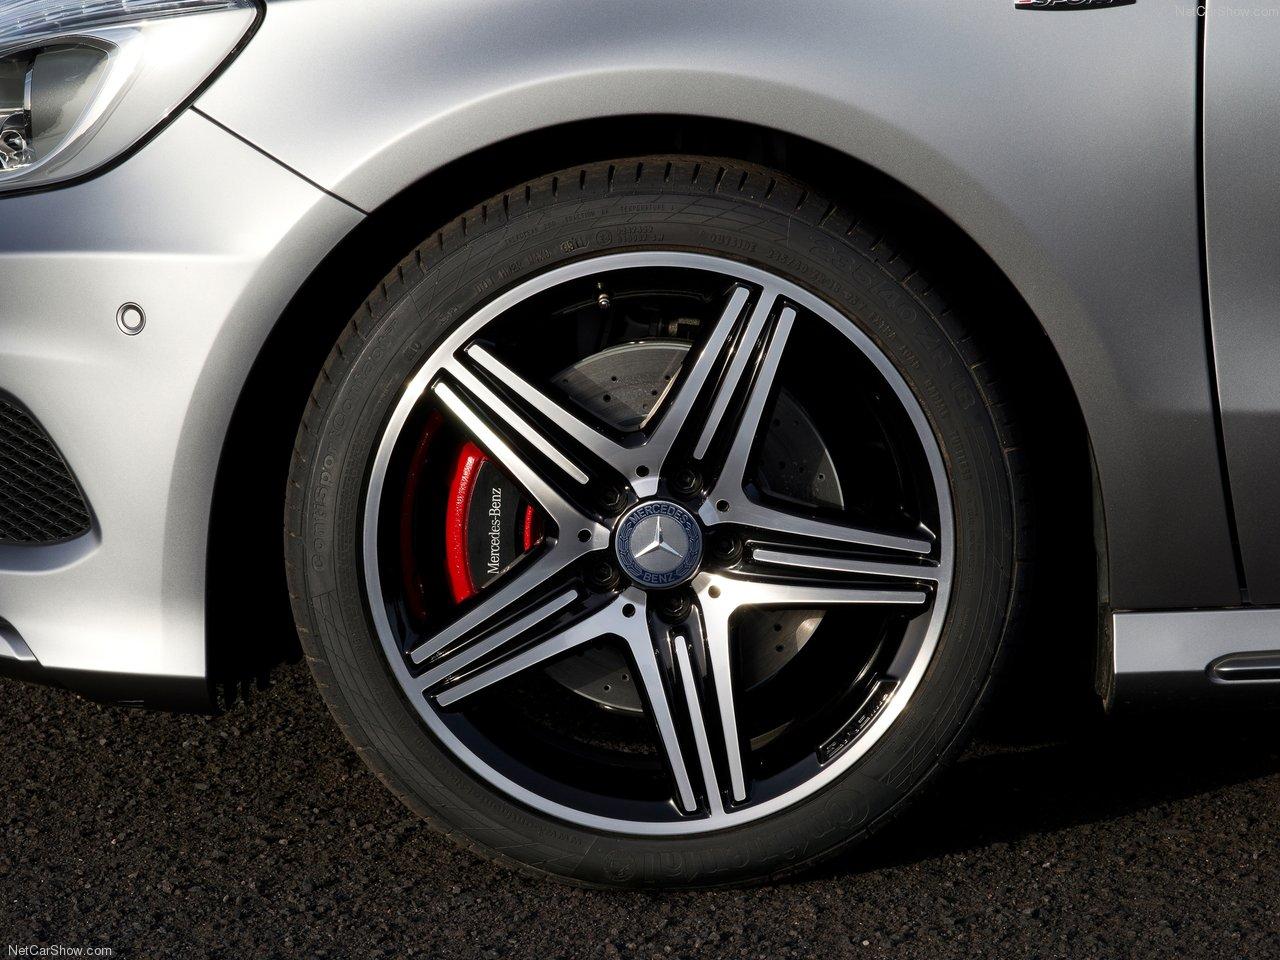 18 amg 5 spoke alloy wheels standard on engineered by amg